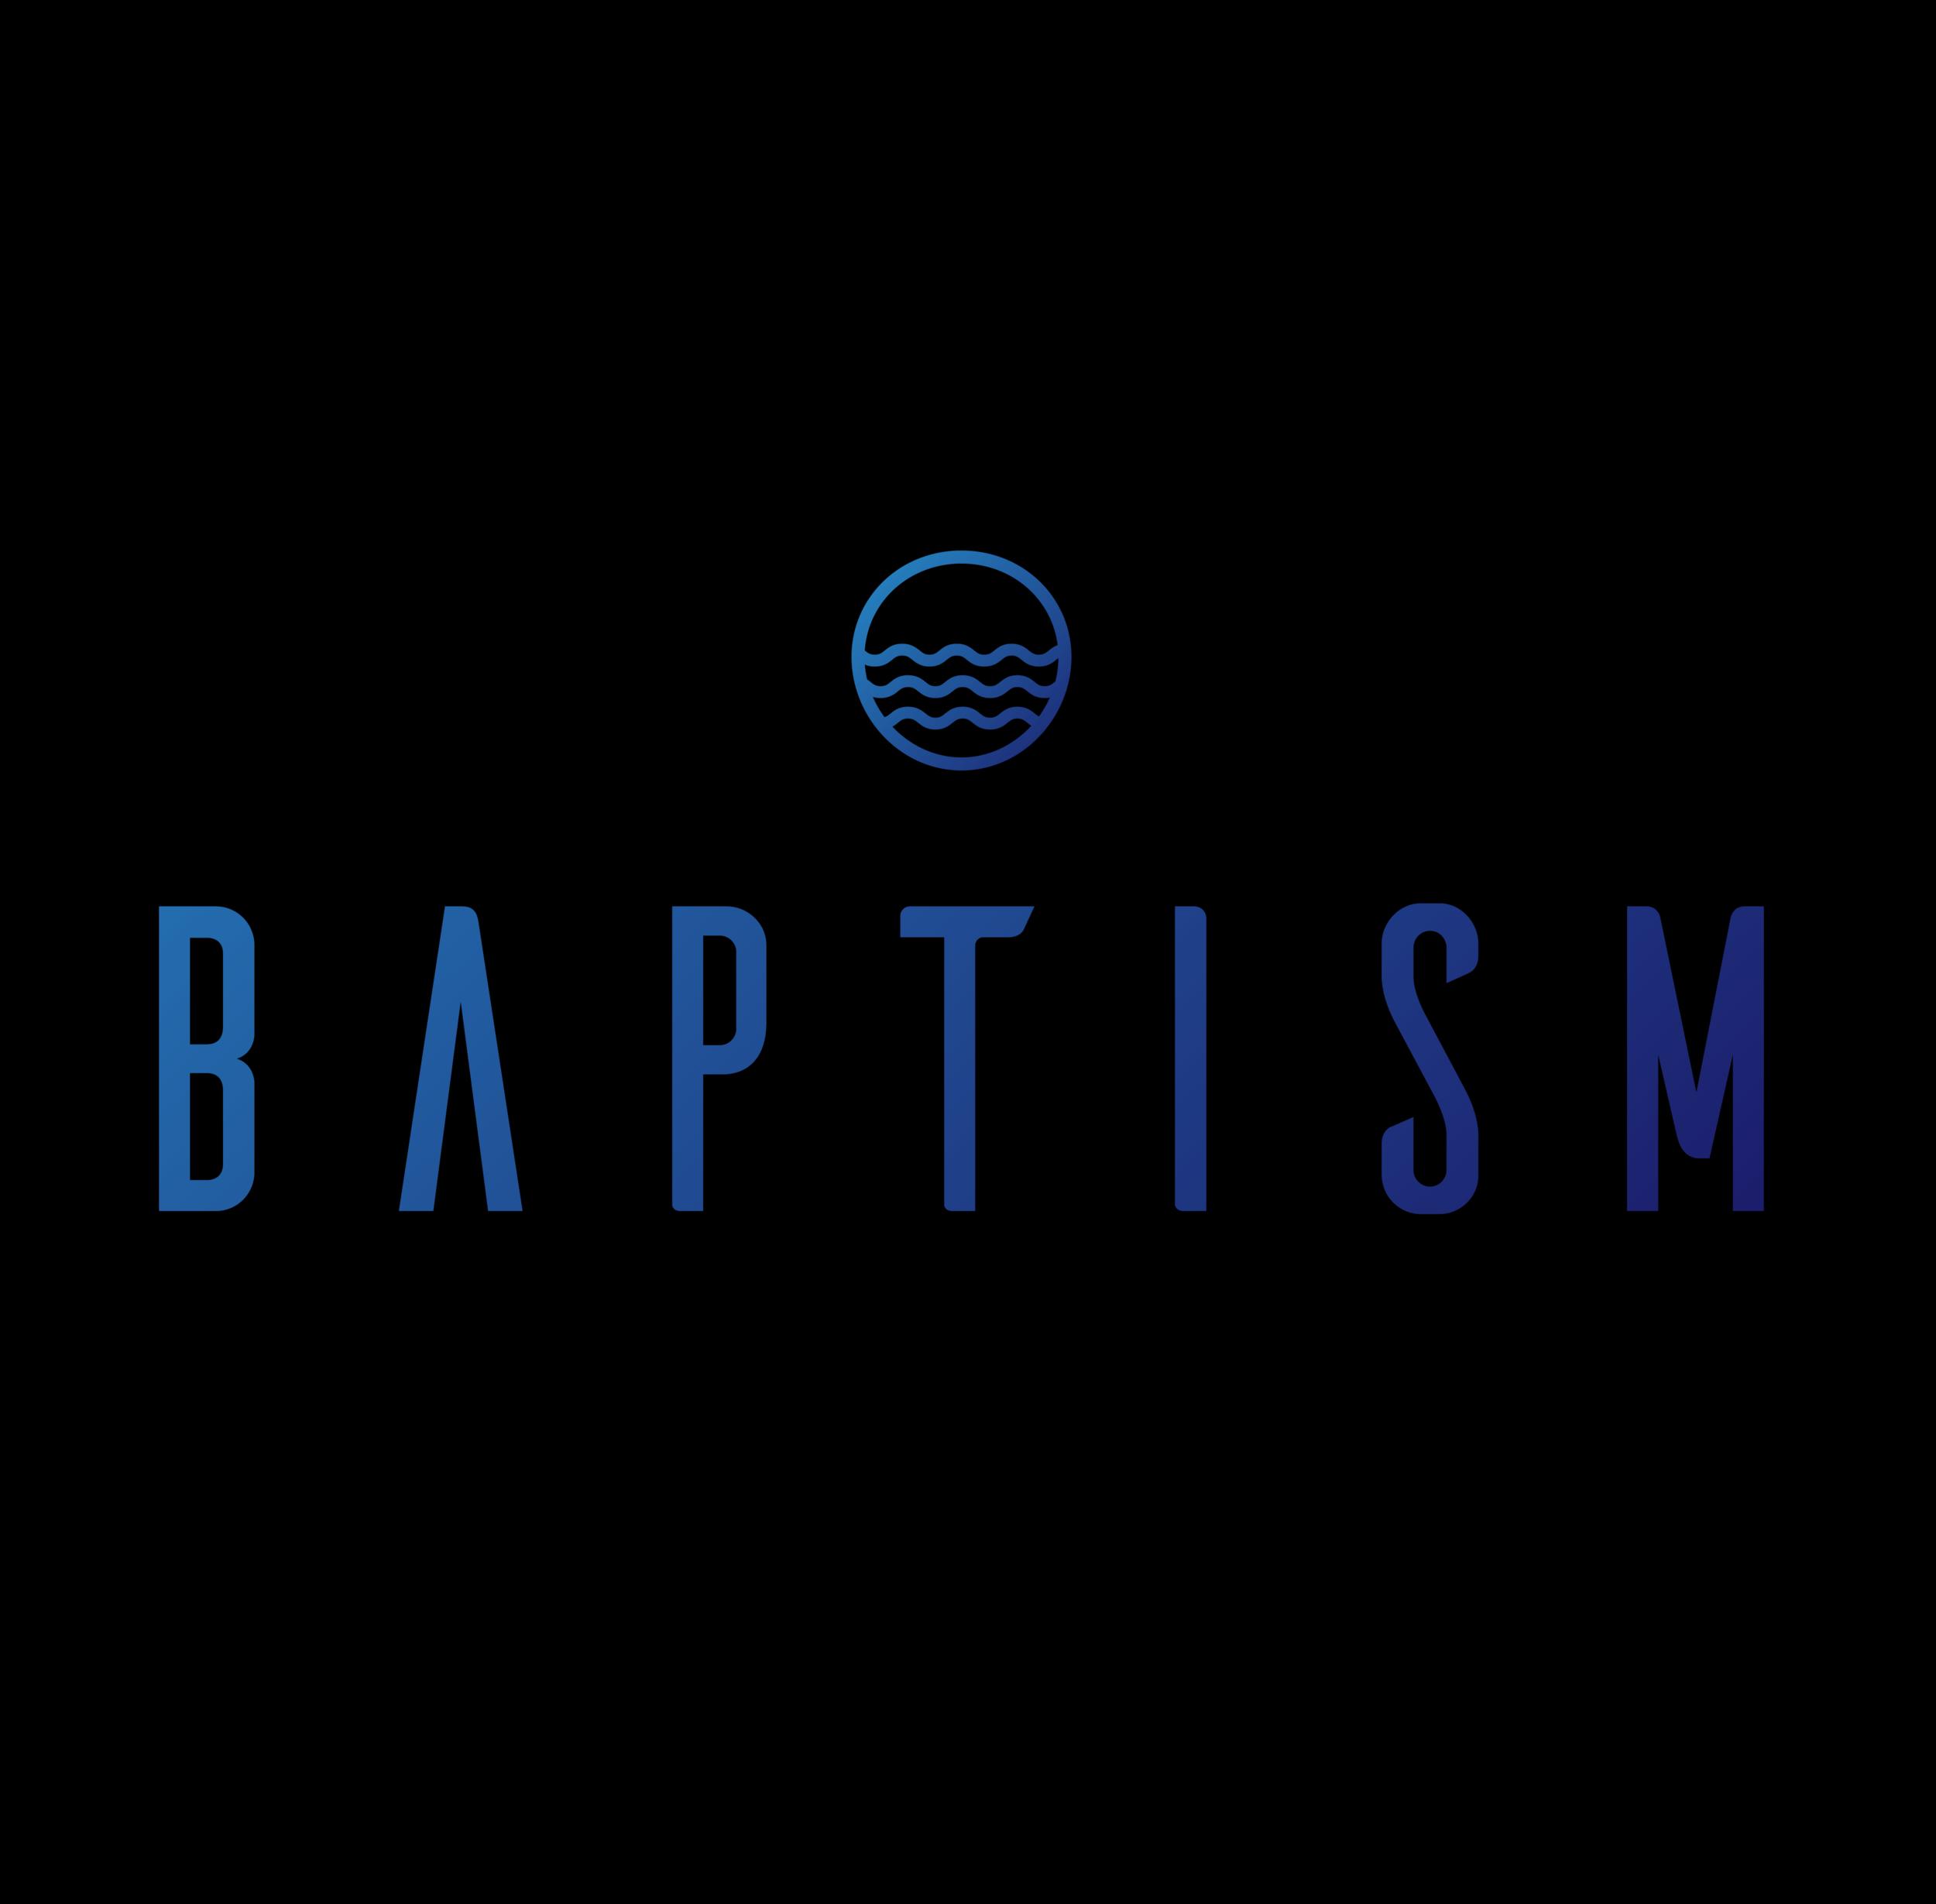 baptism-01 (1).png